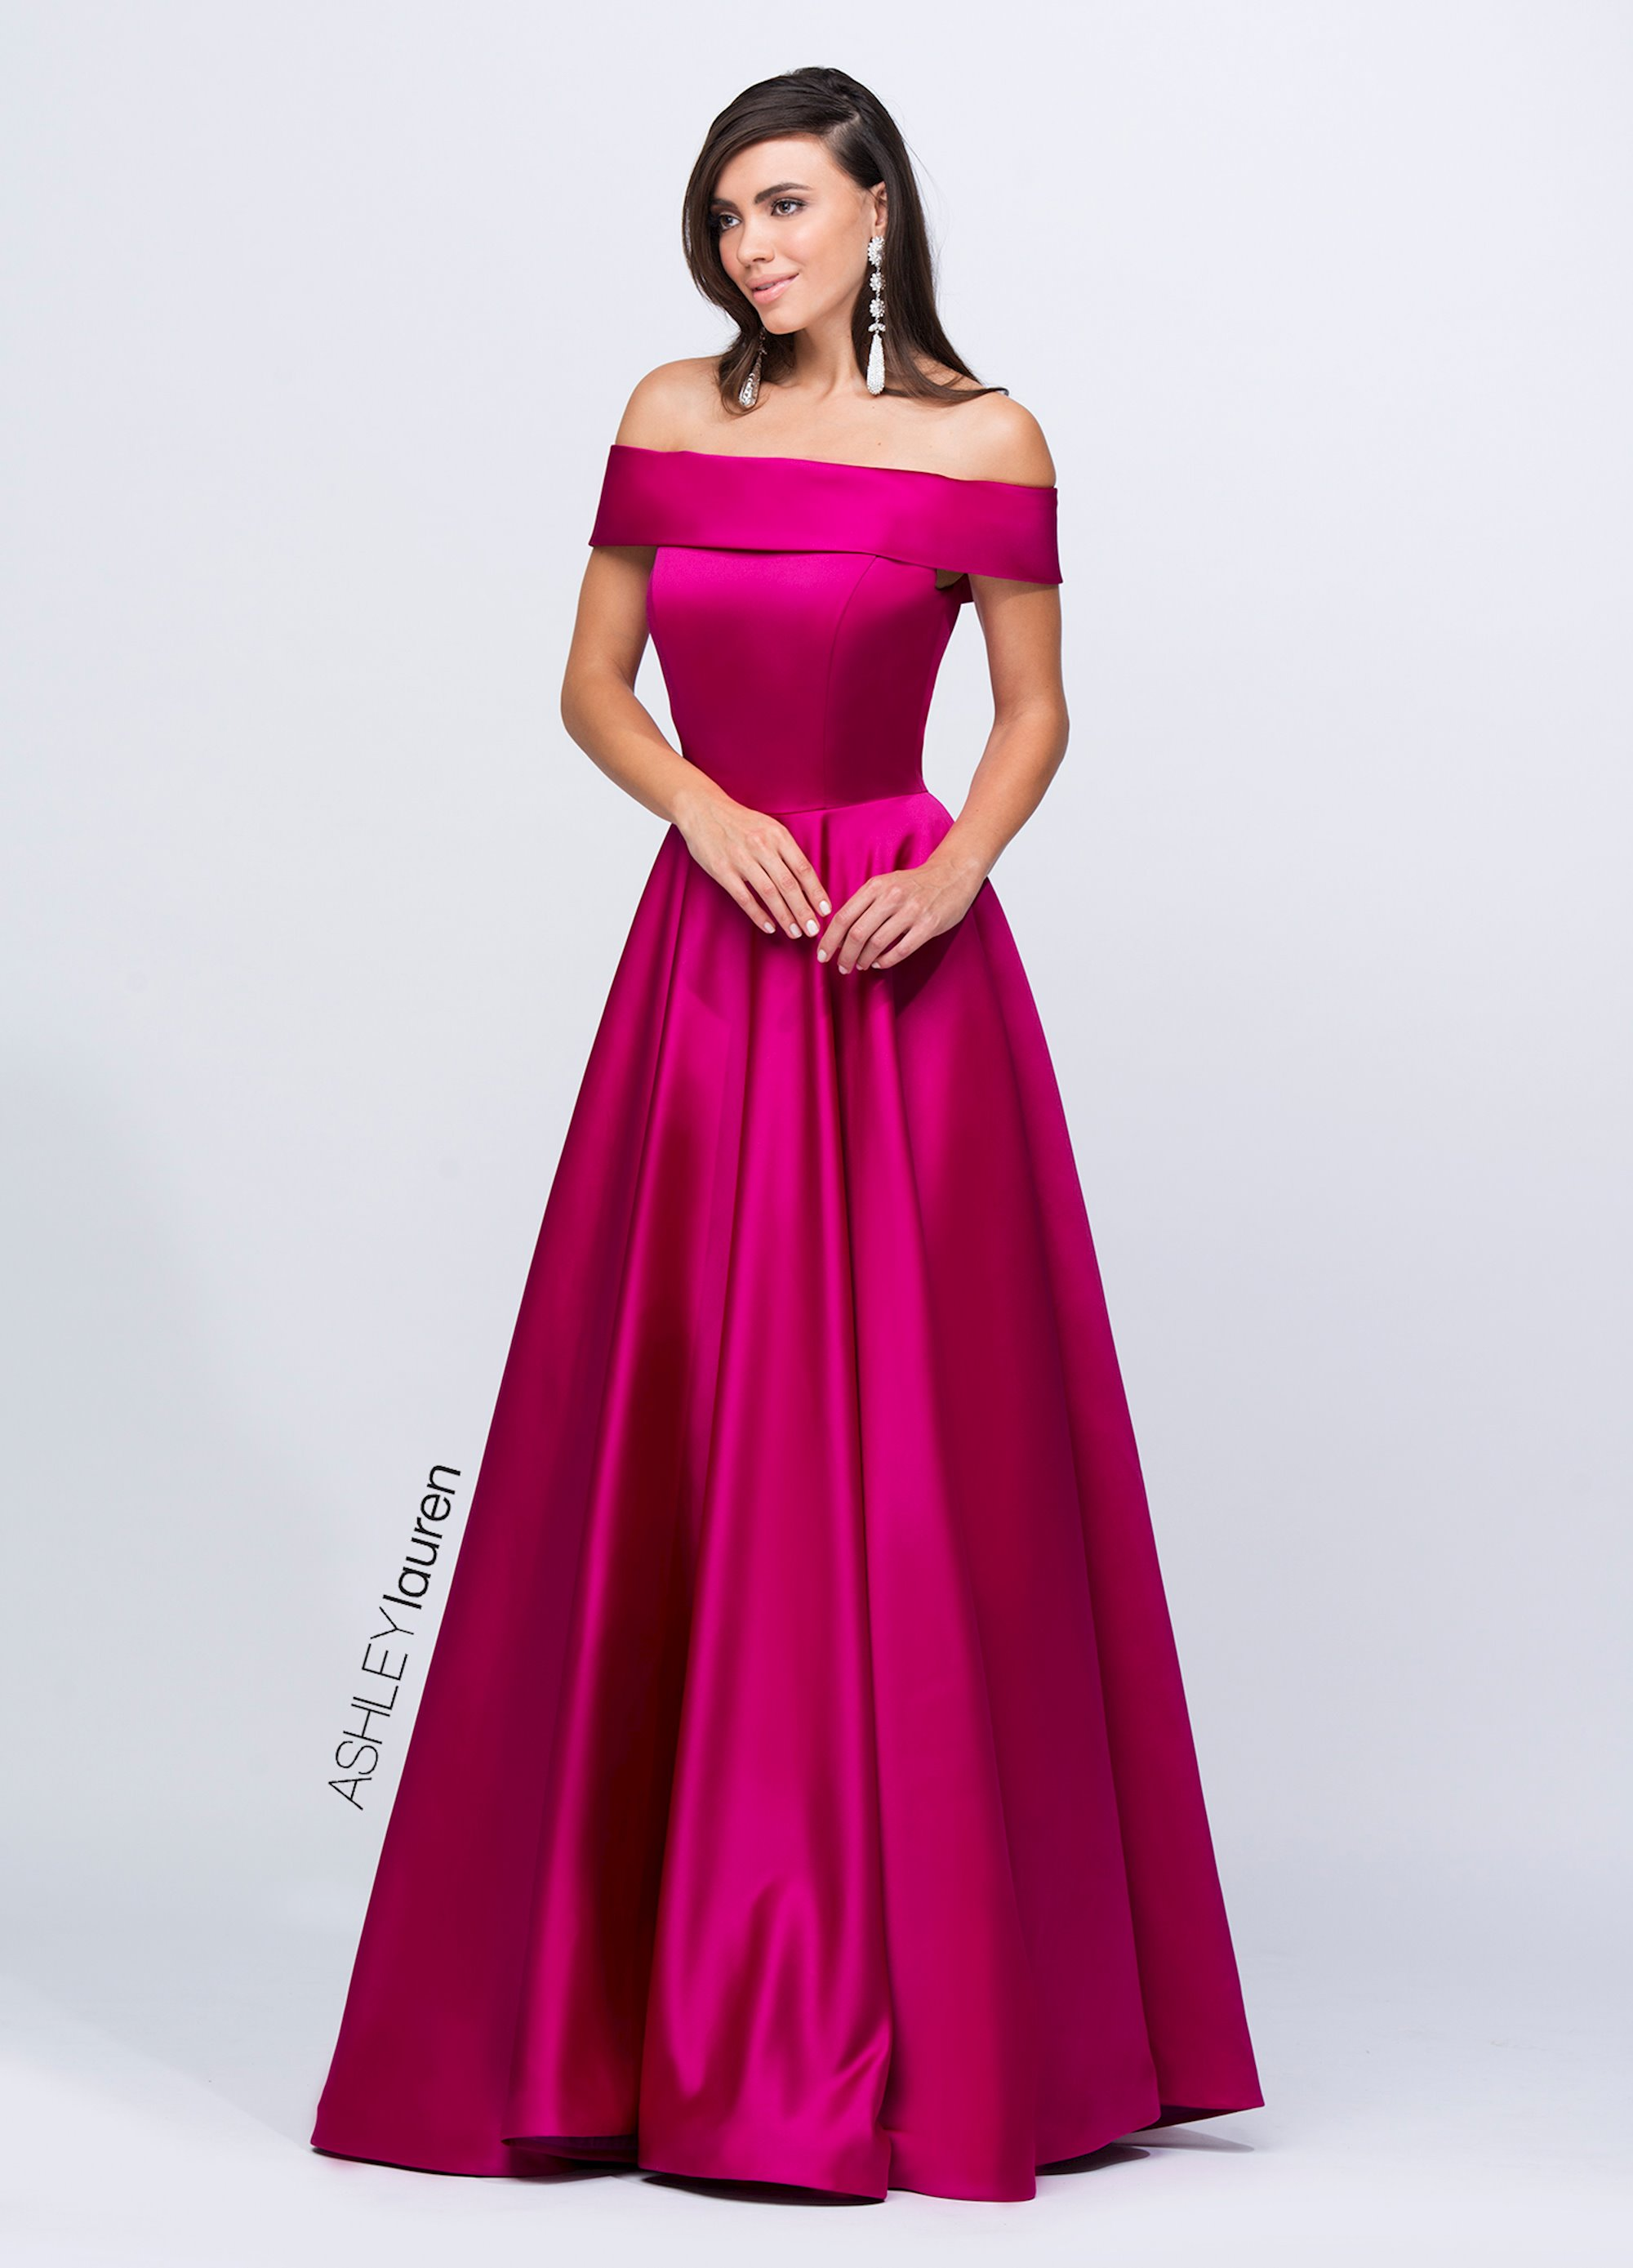 074171d83cf5 Ashley Lauren Off Shoulder Evening Ball Gown. Double tap to zoom